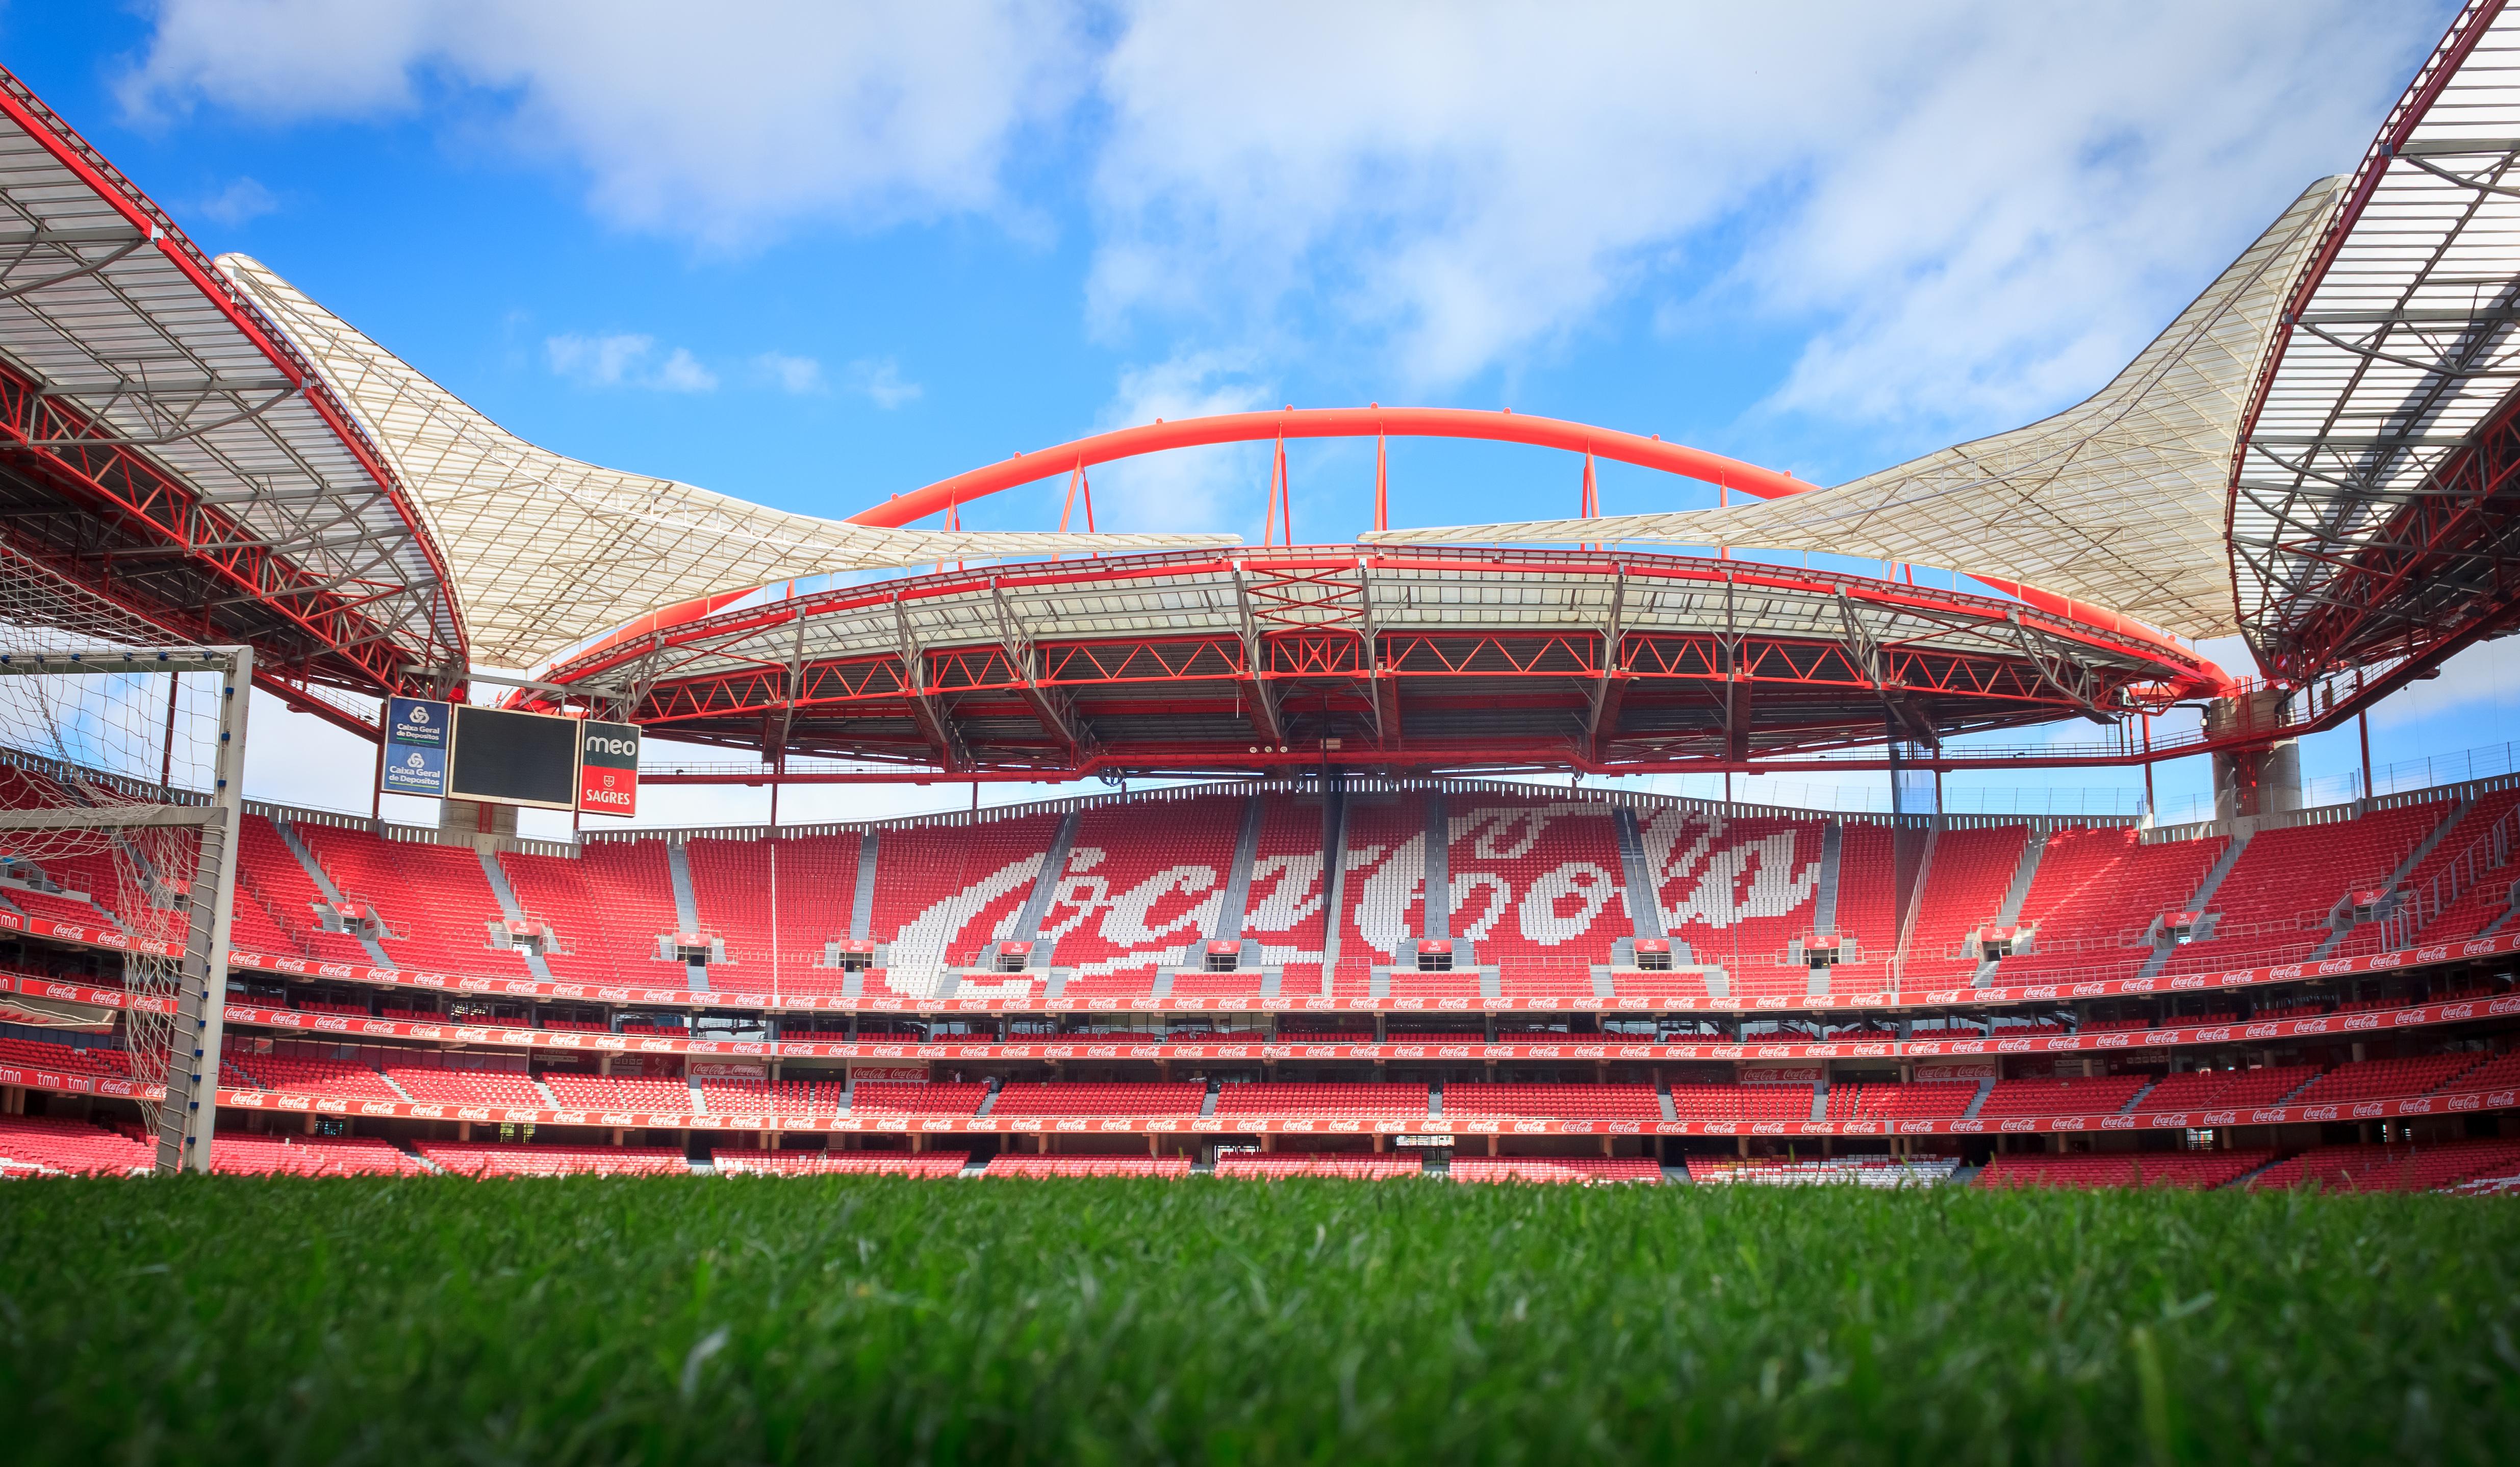 Stadium Food Preview